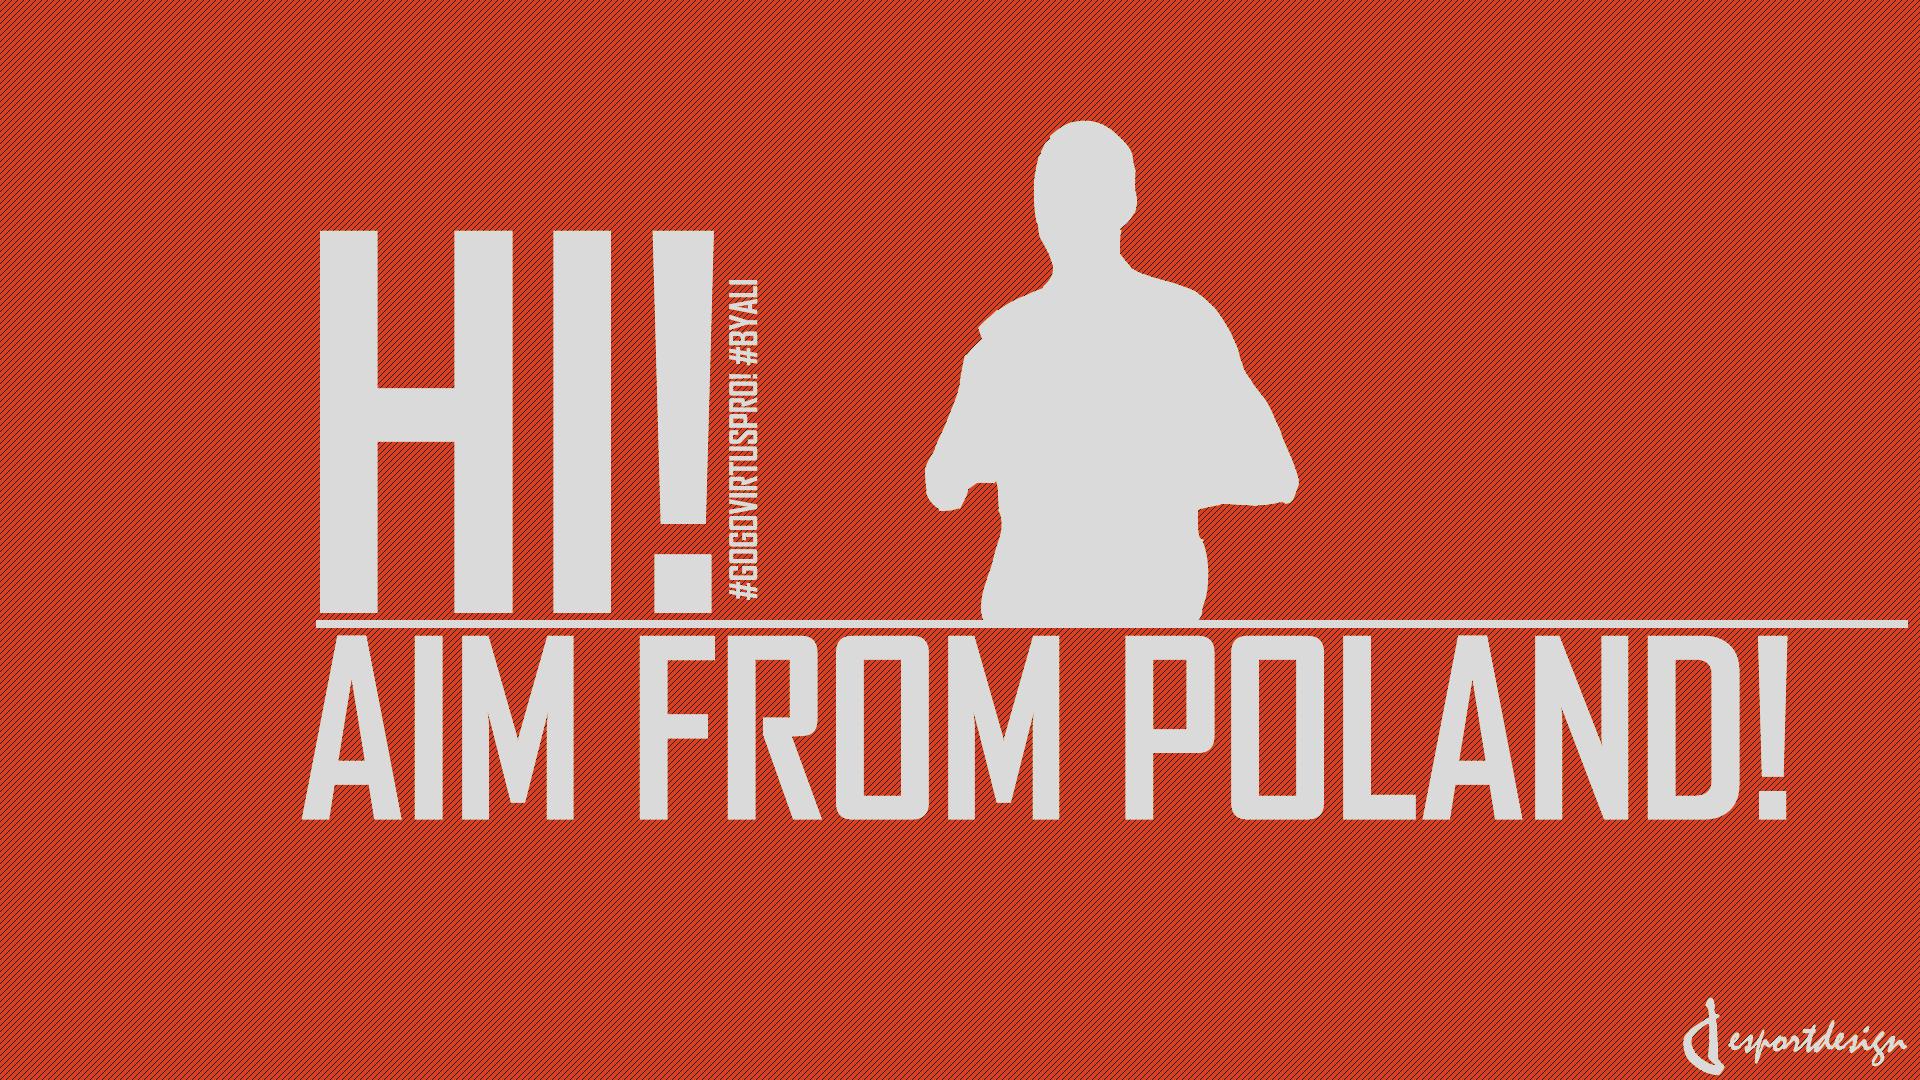 AIM from Poland